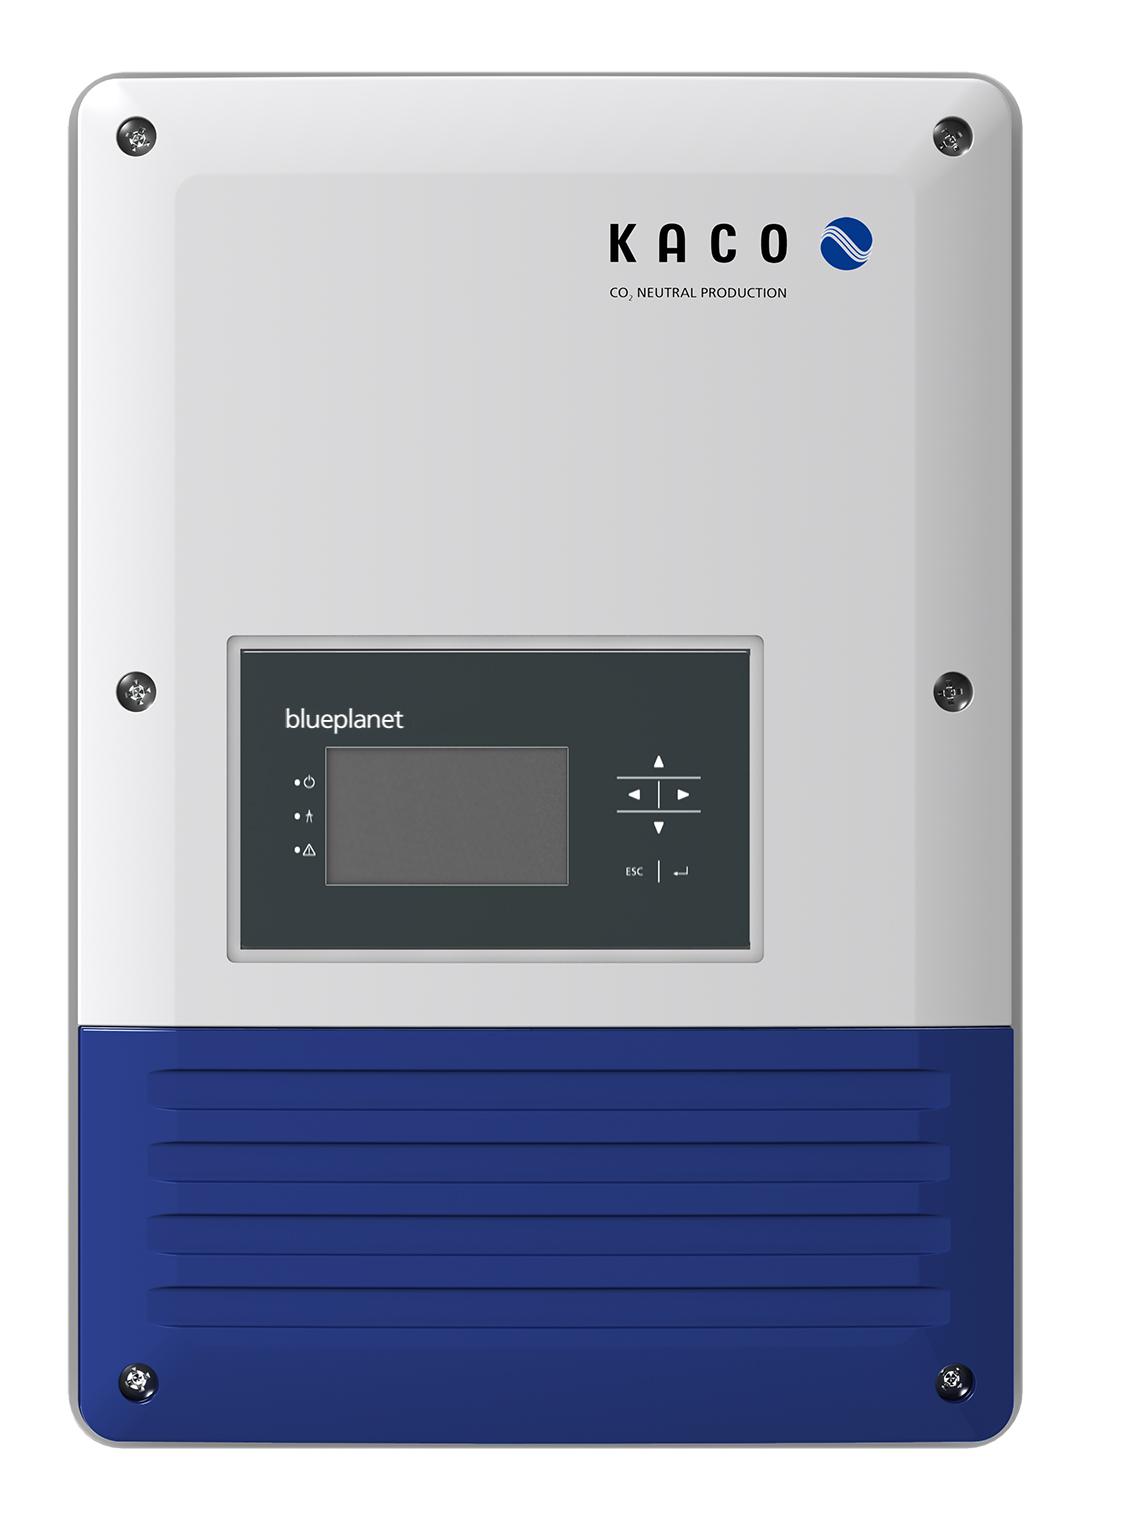 1 Stk Kaco blueplanet 6.5 TL3 3ph IP65 2 MPP-Tracker  PVI50065--